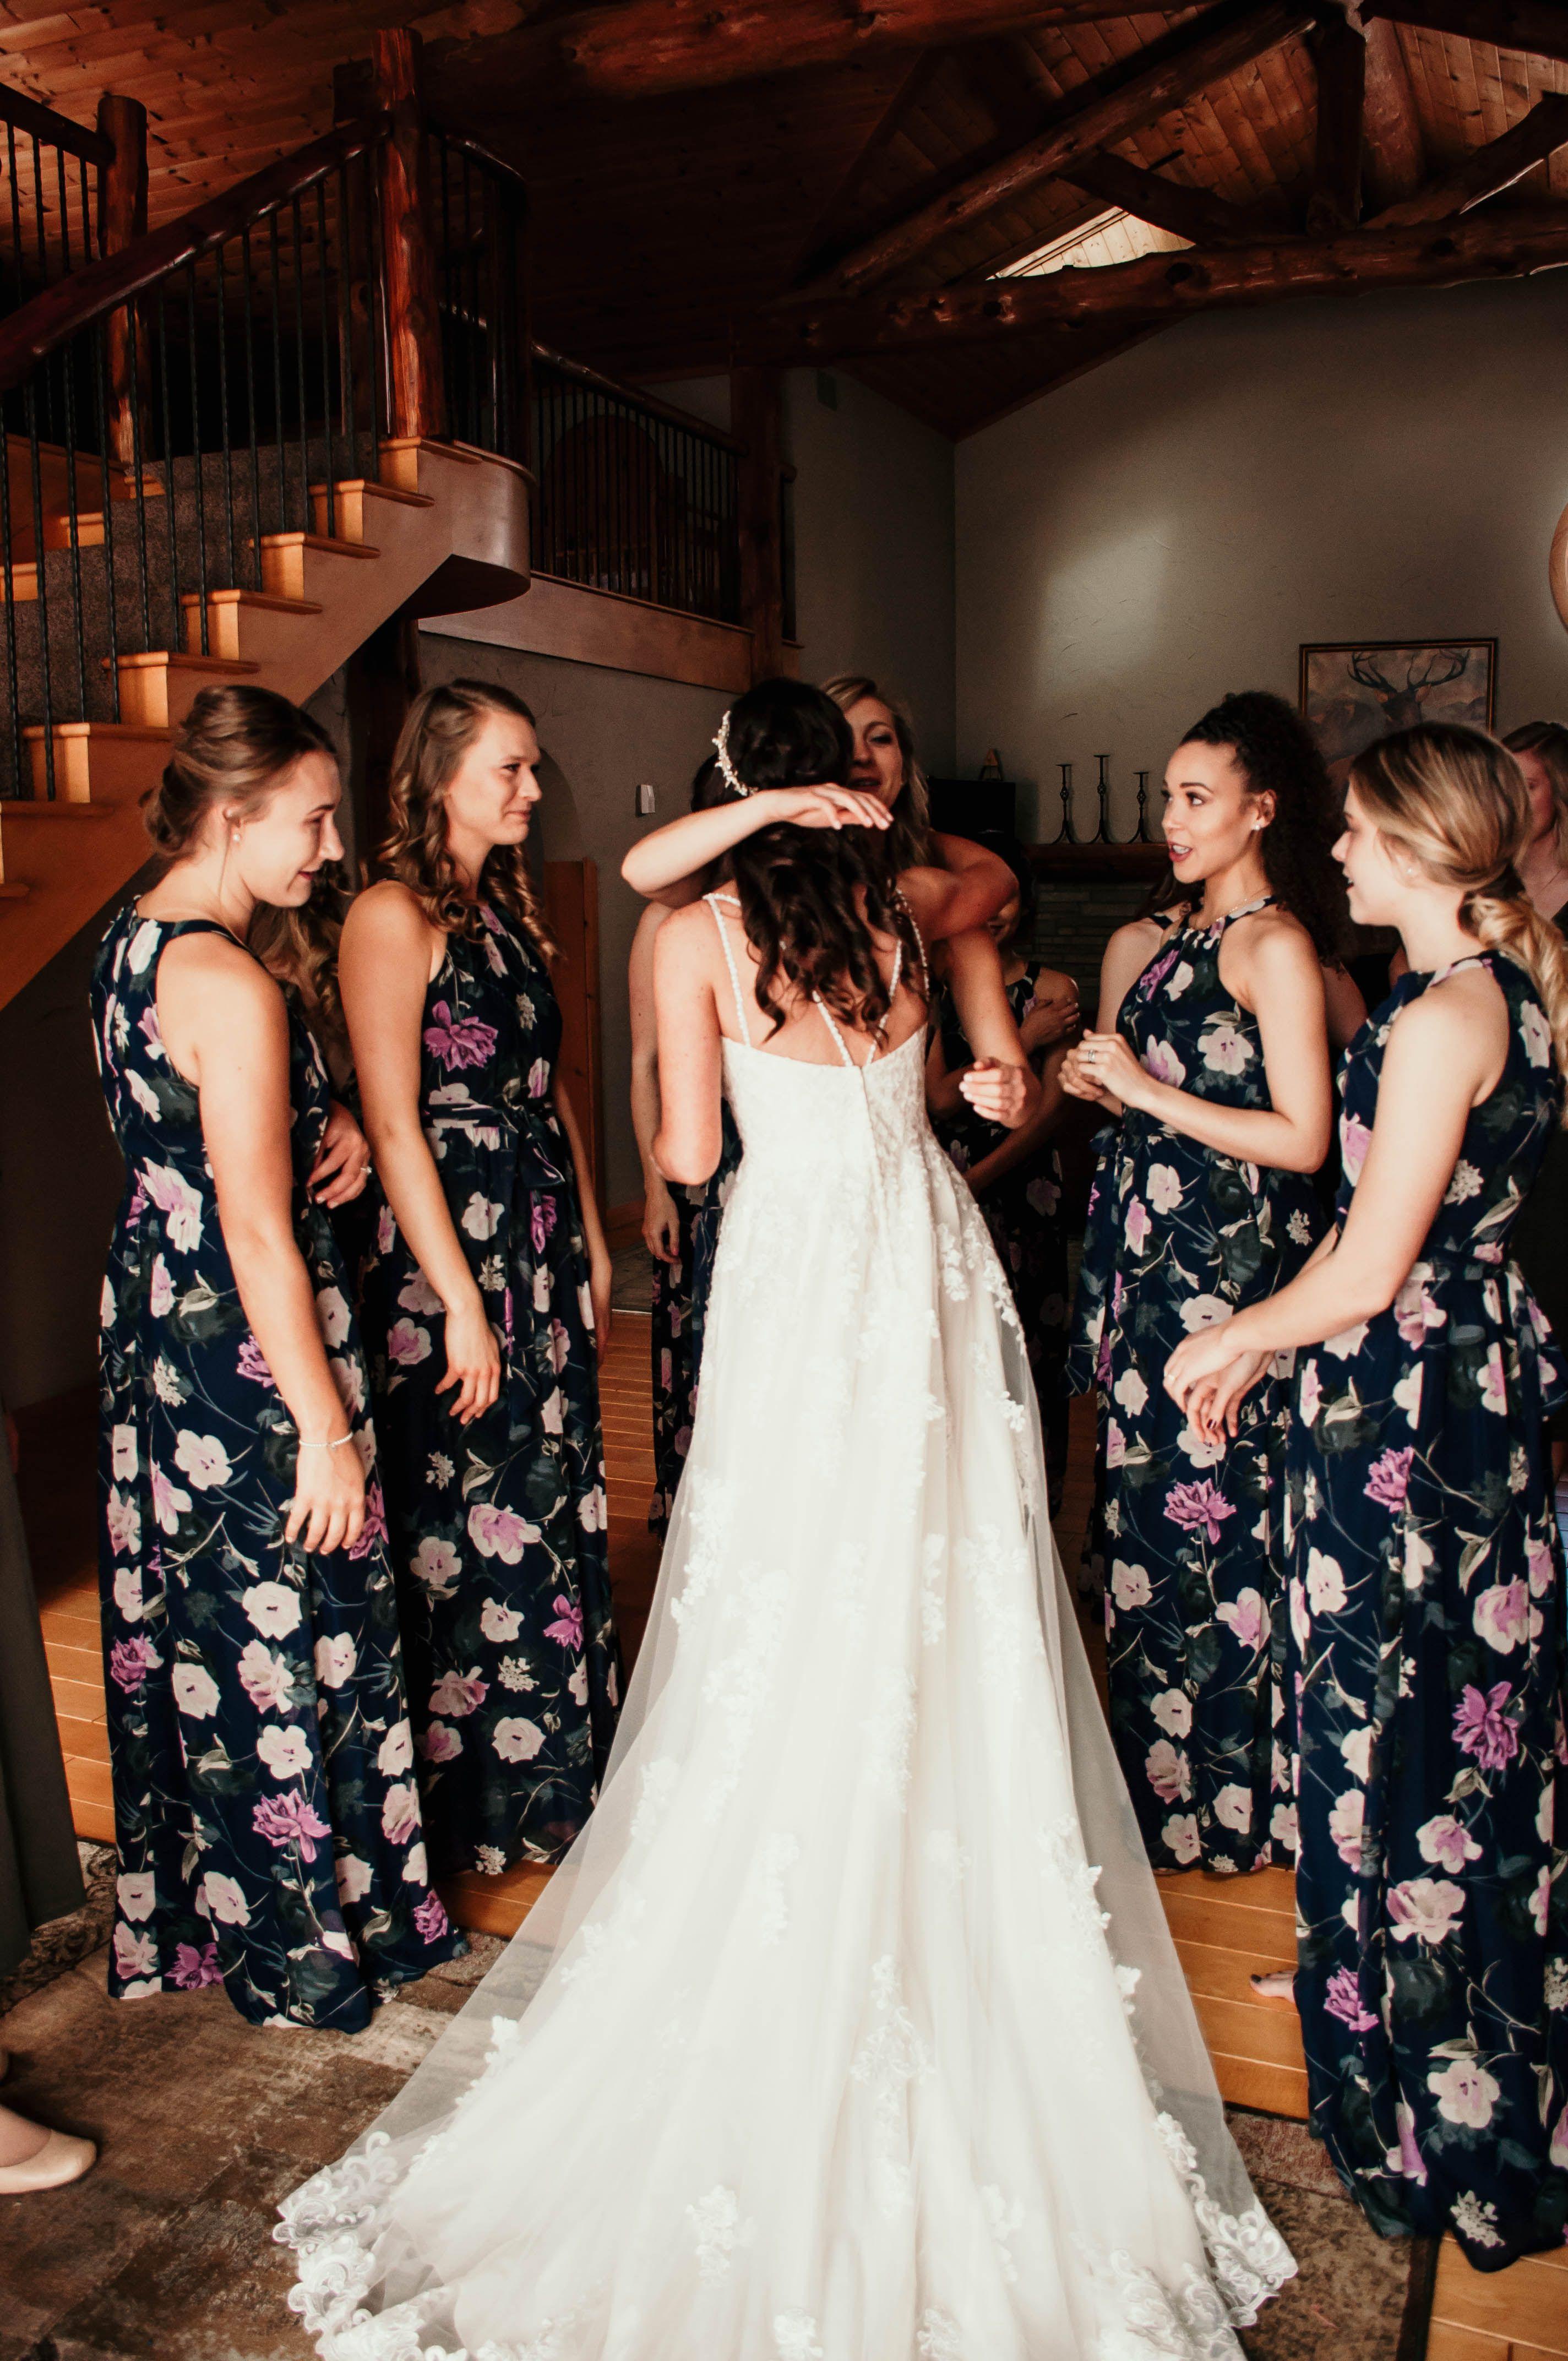 Bridesmaids First Look In 2020 Bridesmaid Bridesmaid Dresses Wedding Dresses